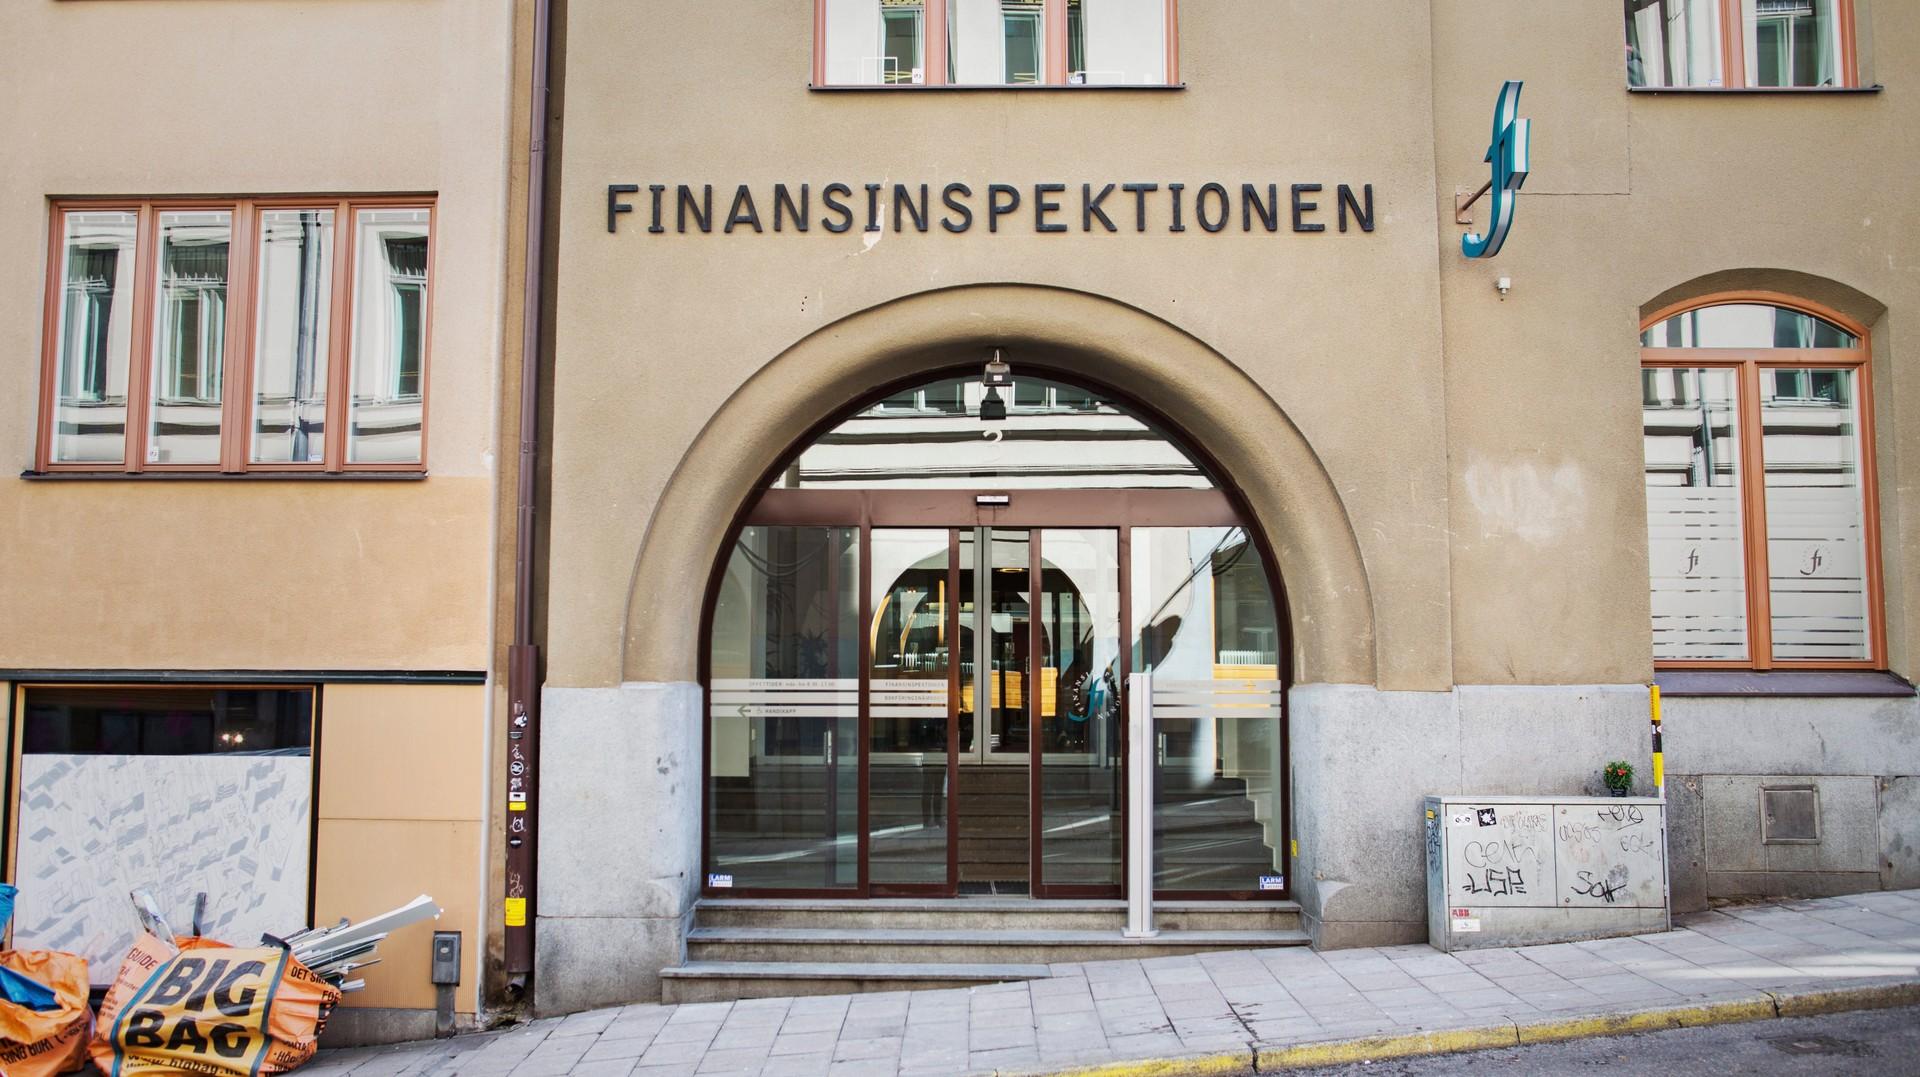 finansinspektionen-byggnad